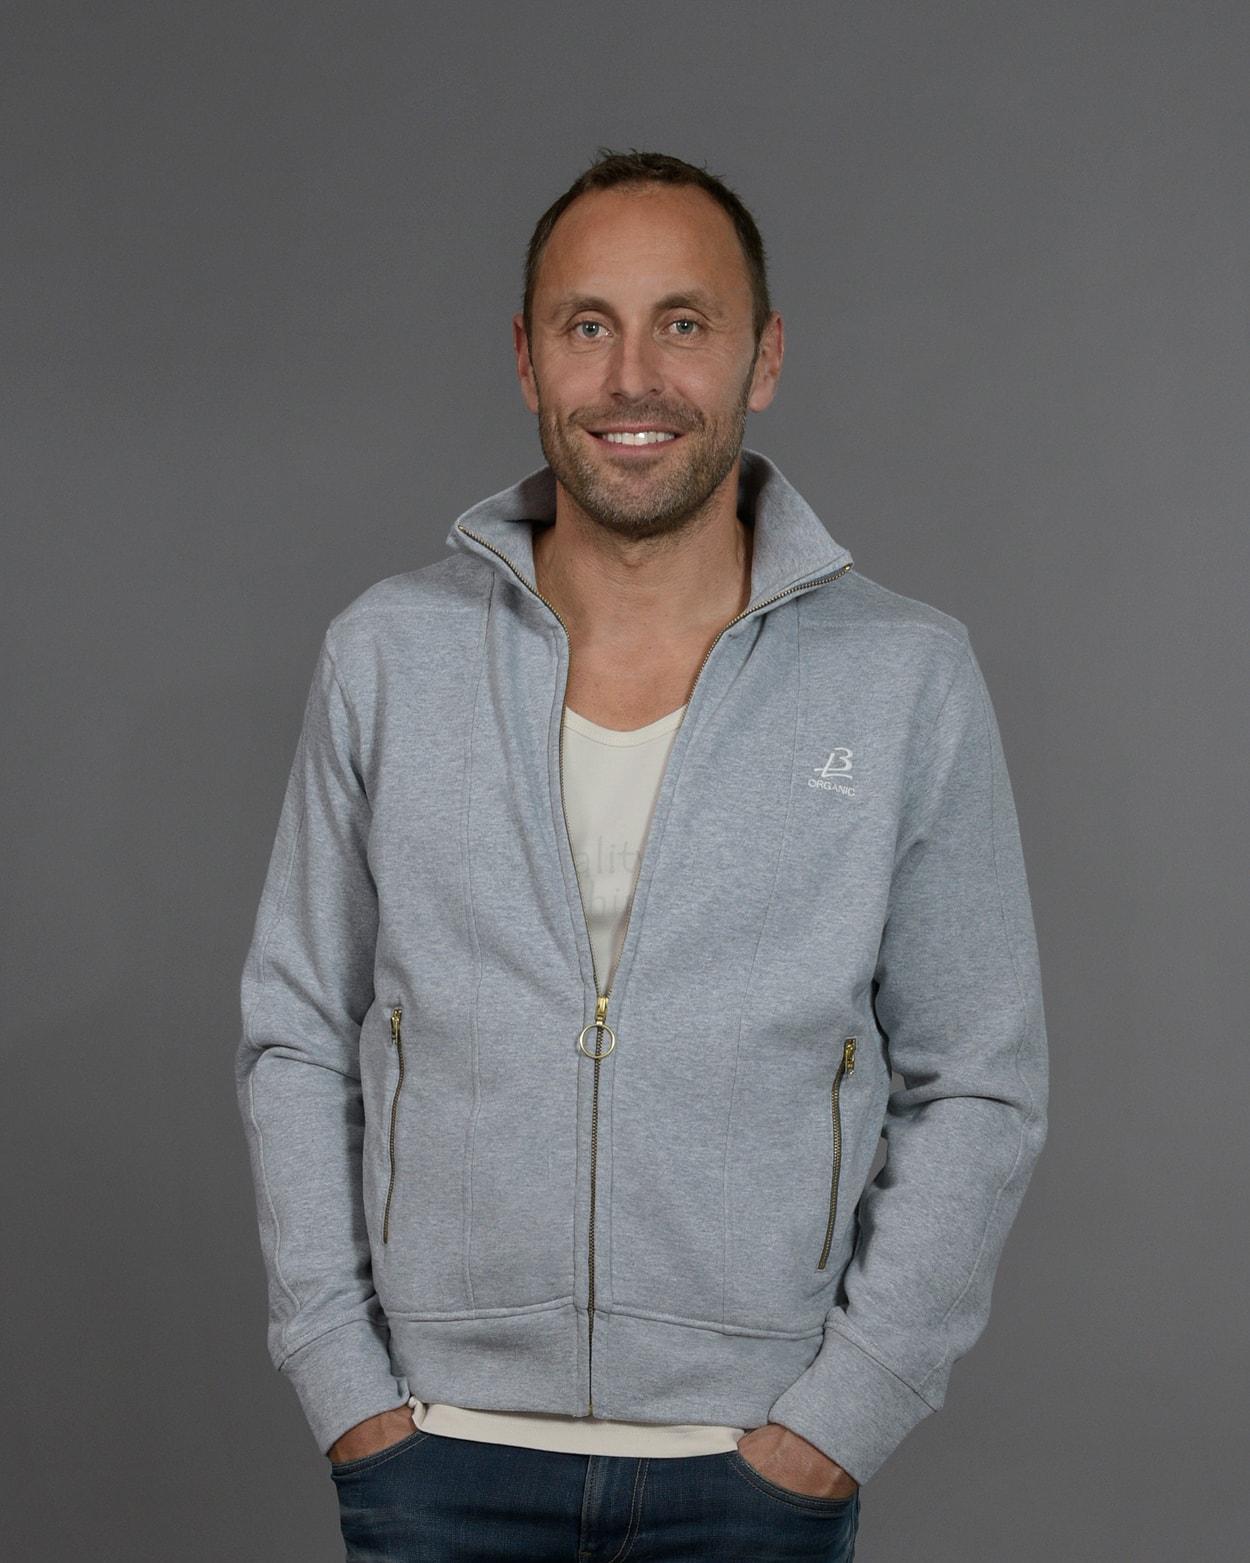 b-light-organic-clothes-jacket-ted-grey-mattias-sunneborn-1